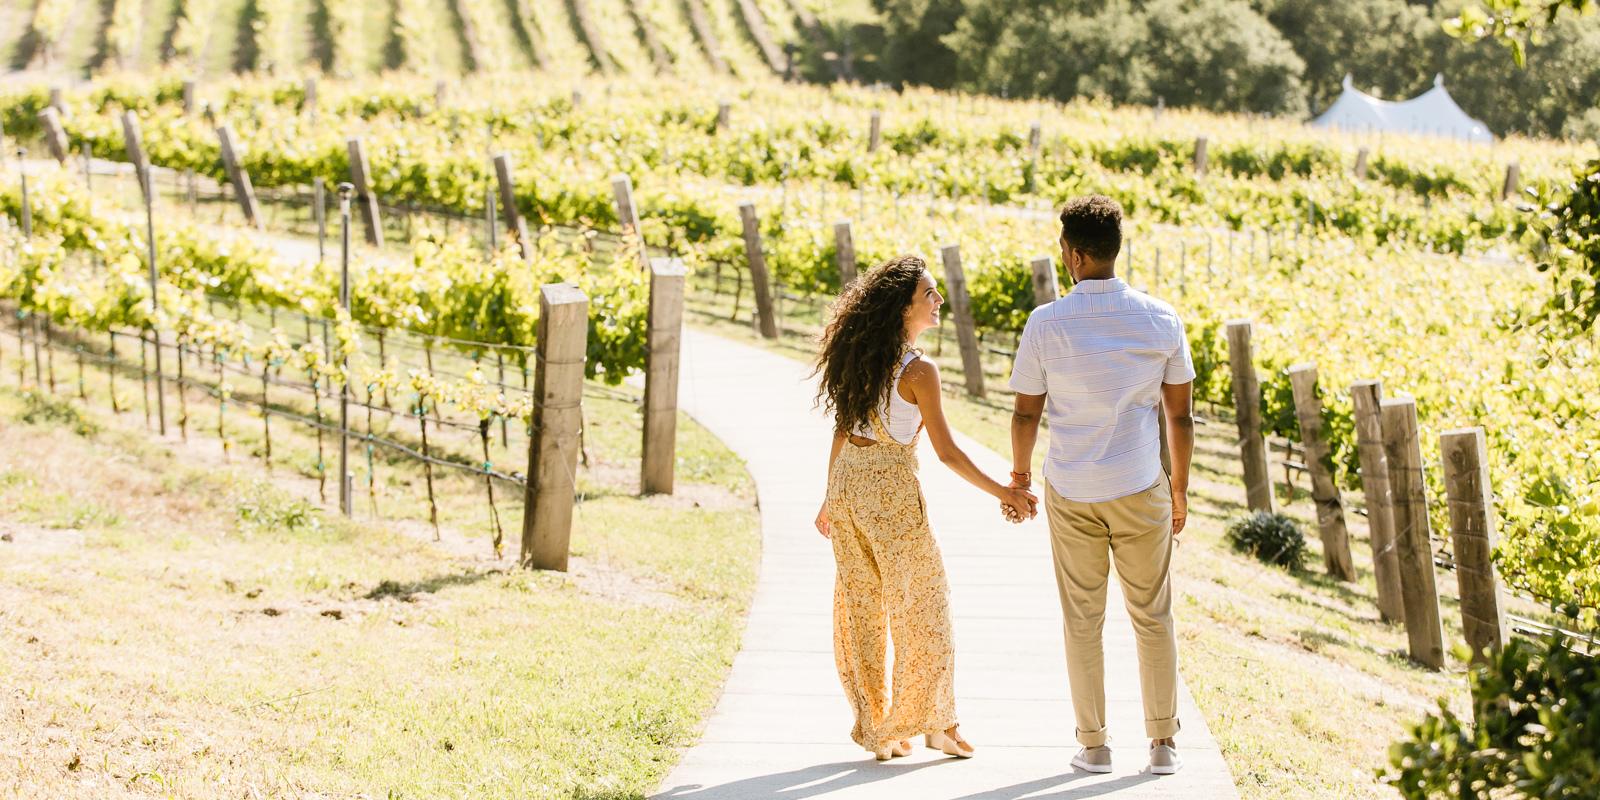 Carmel Valley Ranch_Lifestyle_Vineyard Walk_Couple_3341_KD